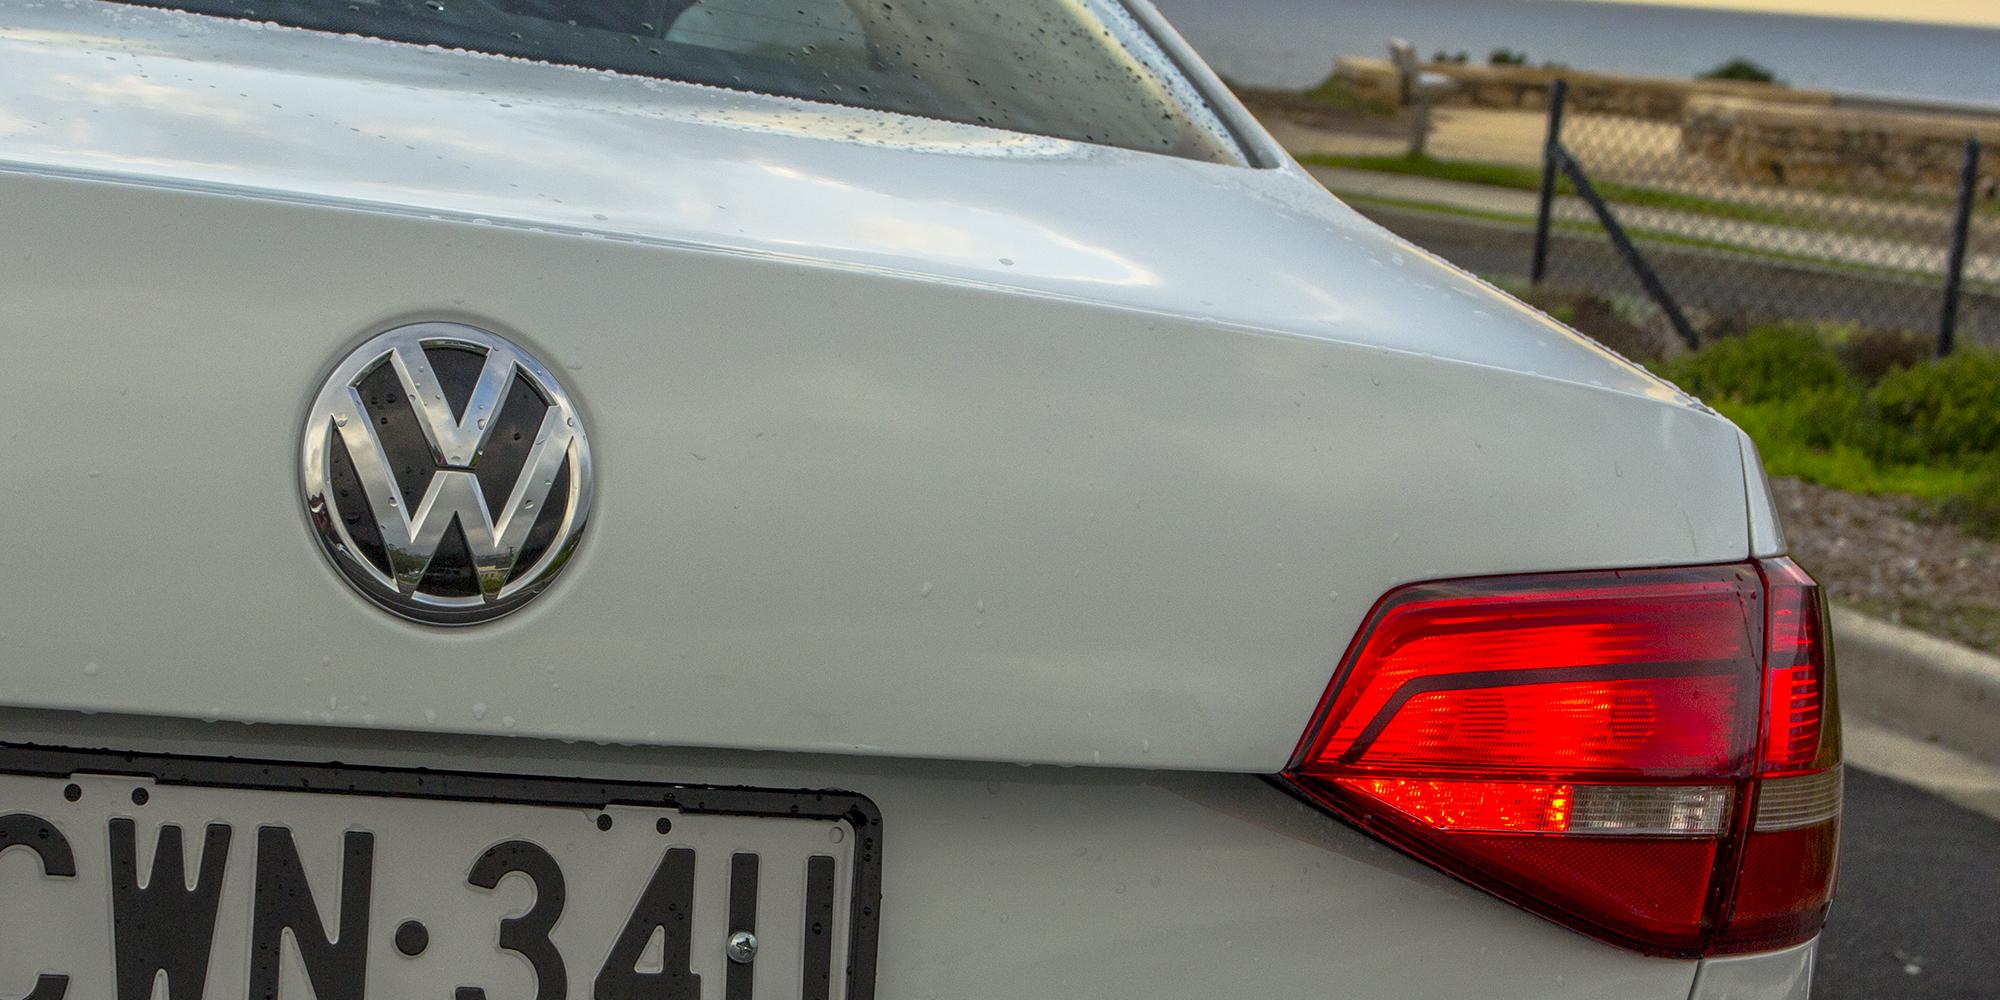 Volkswagen 0 60 Times Quarter Mile Times Vw Gti